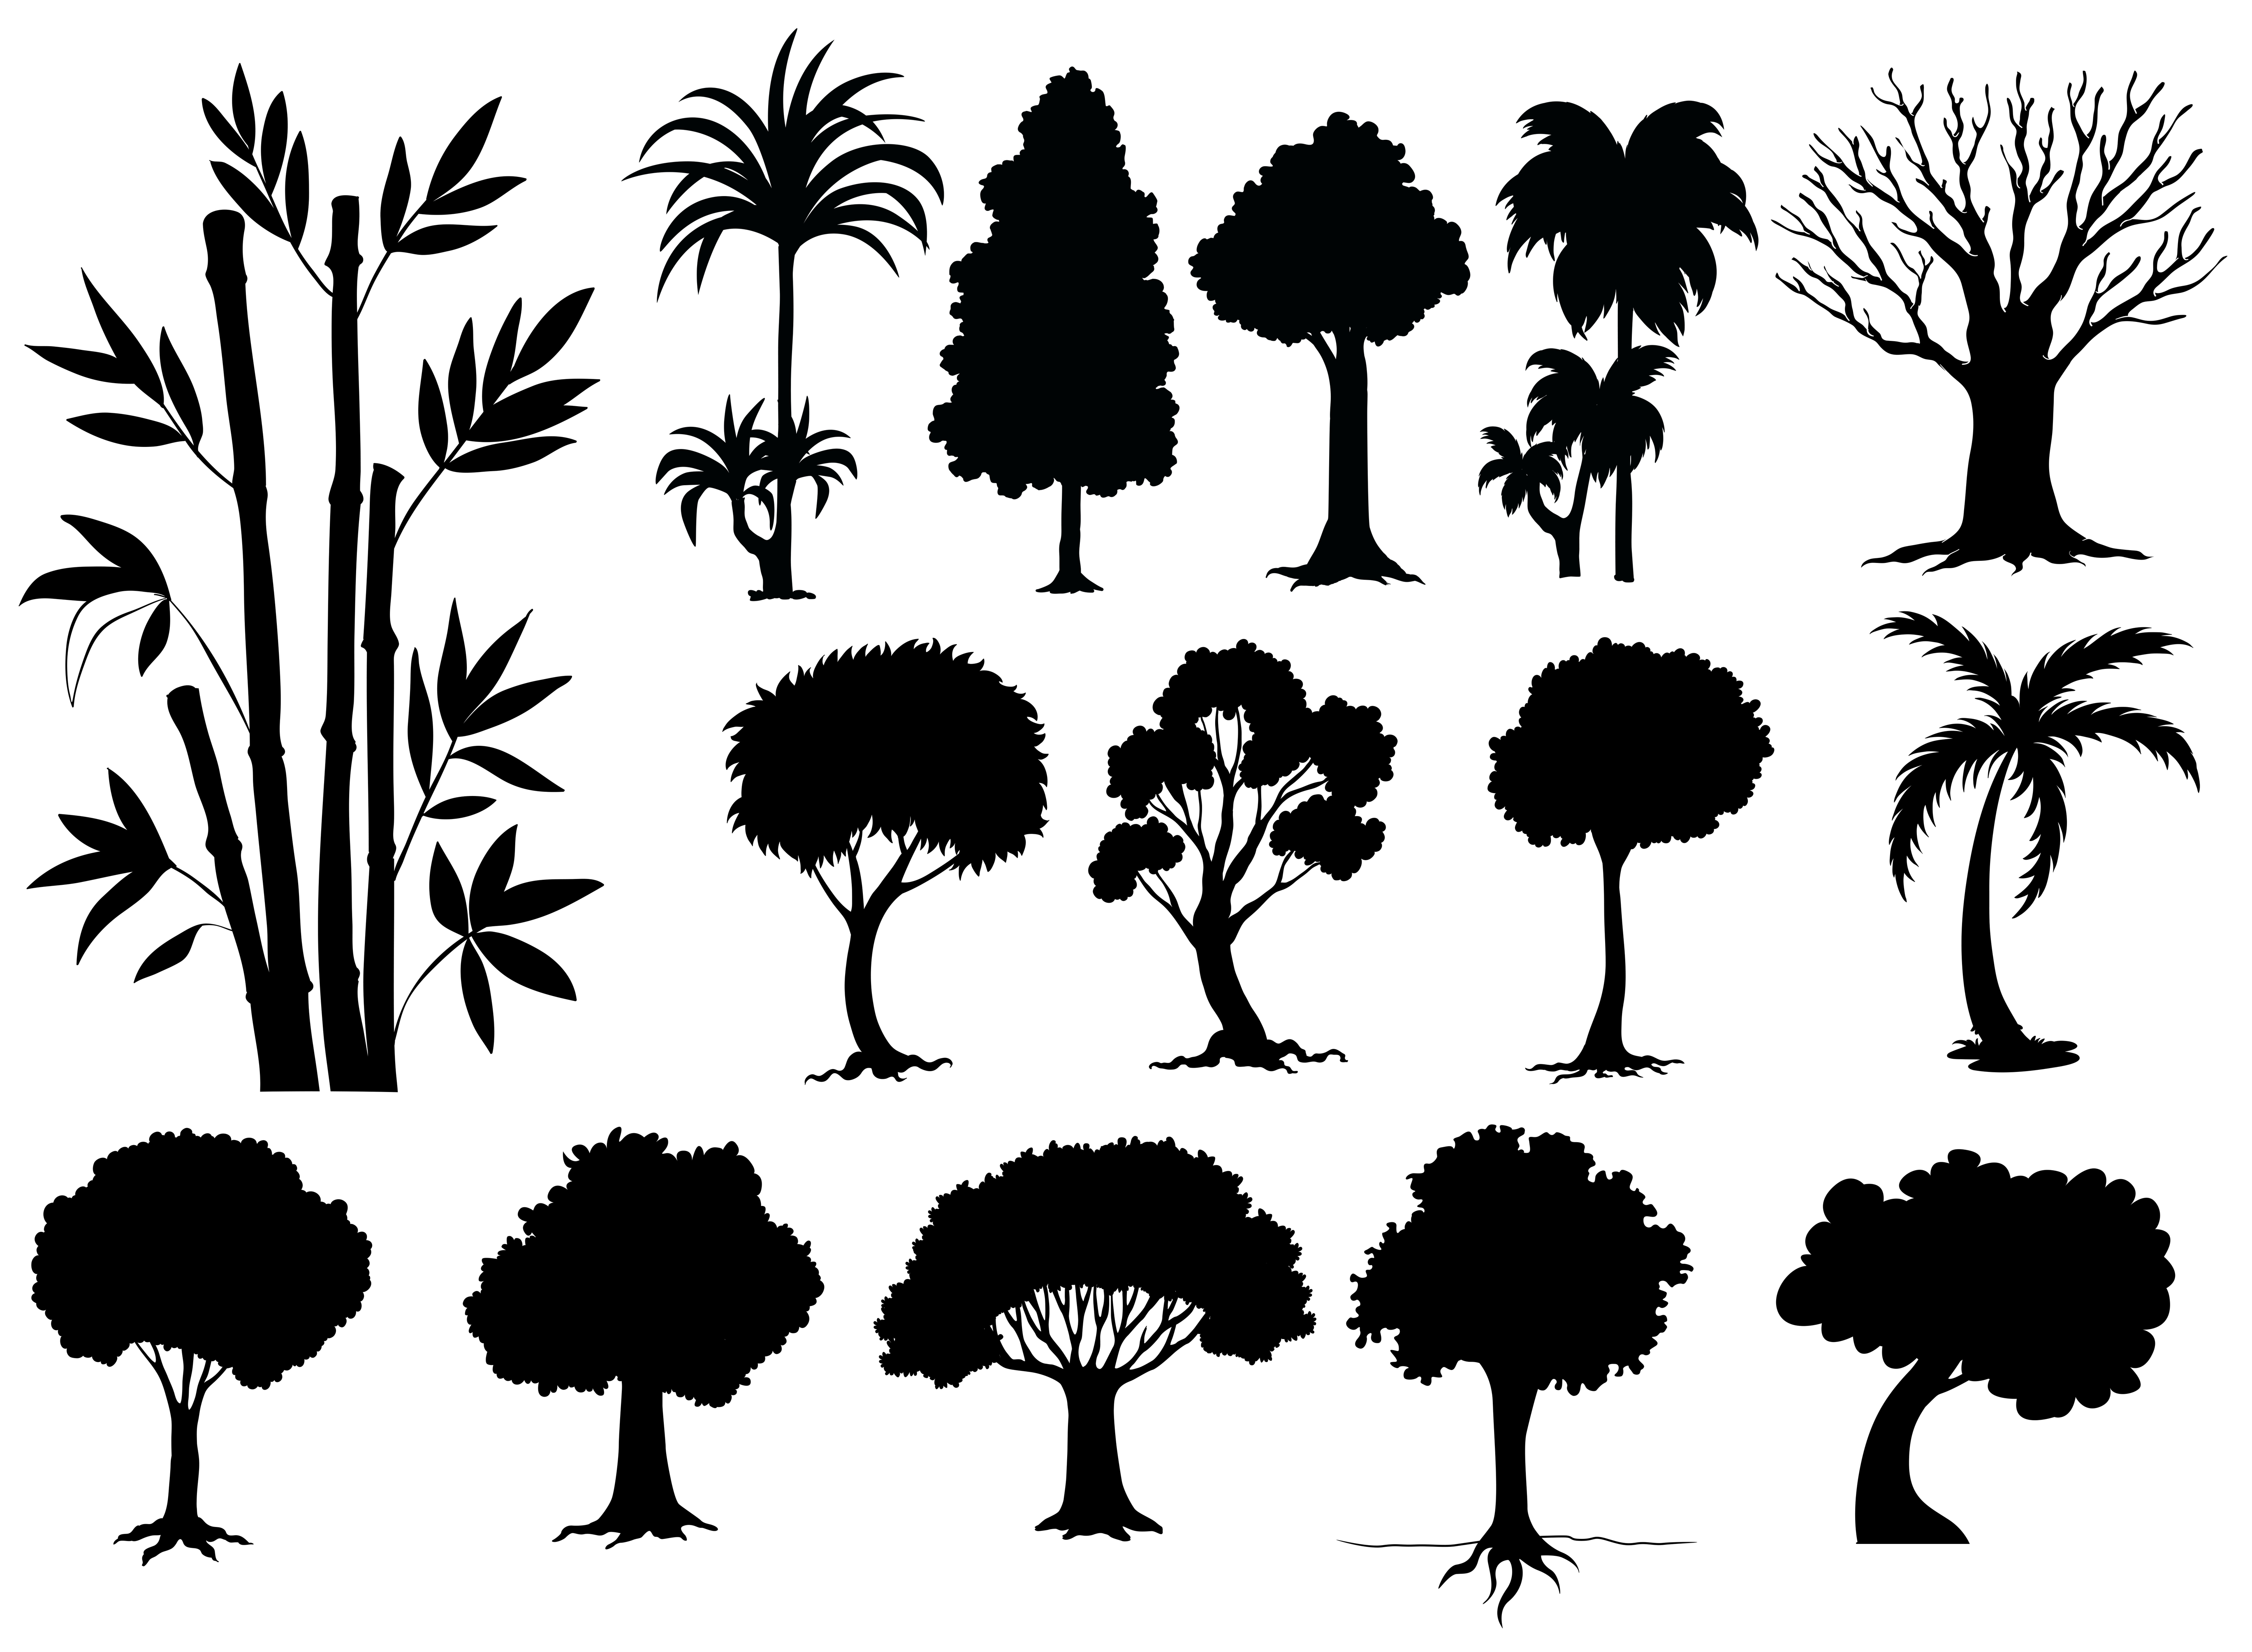 Tree Sihouette Free Vector Art